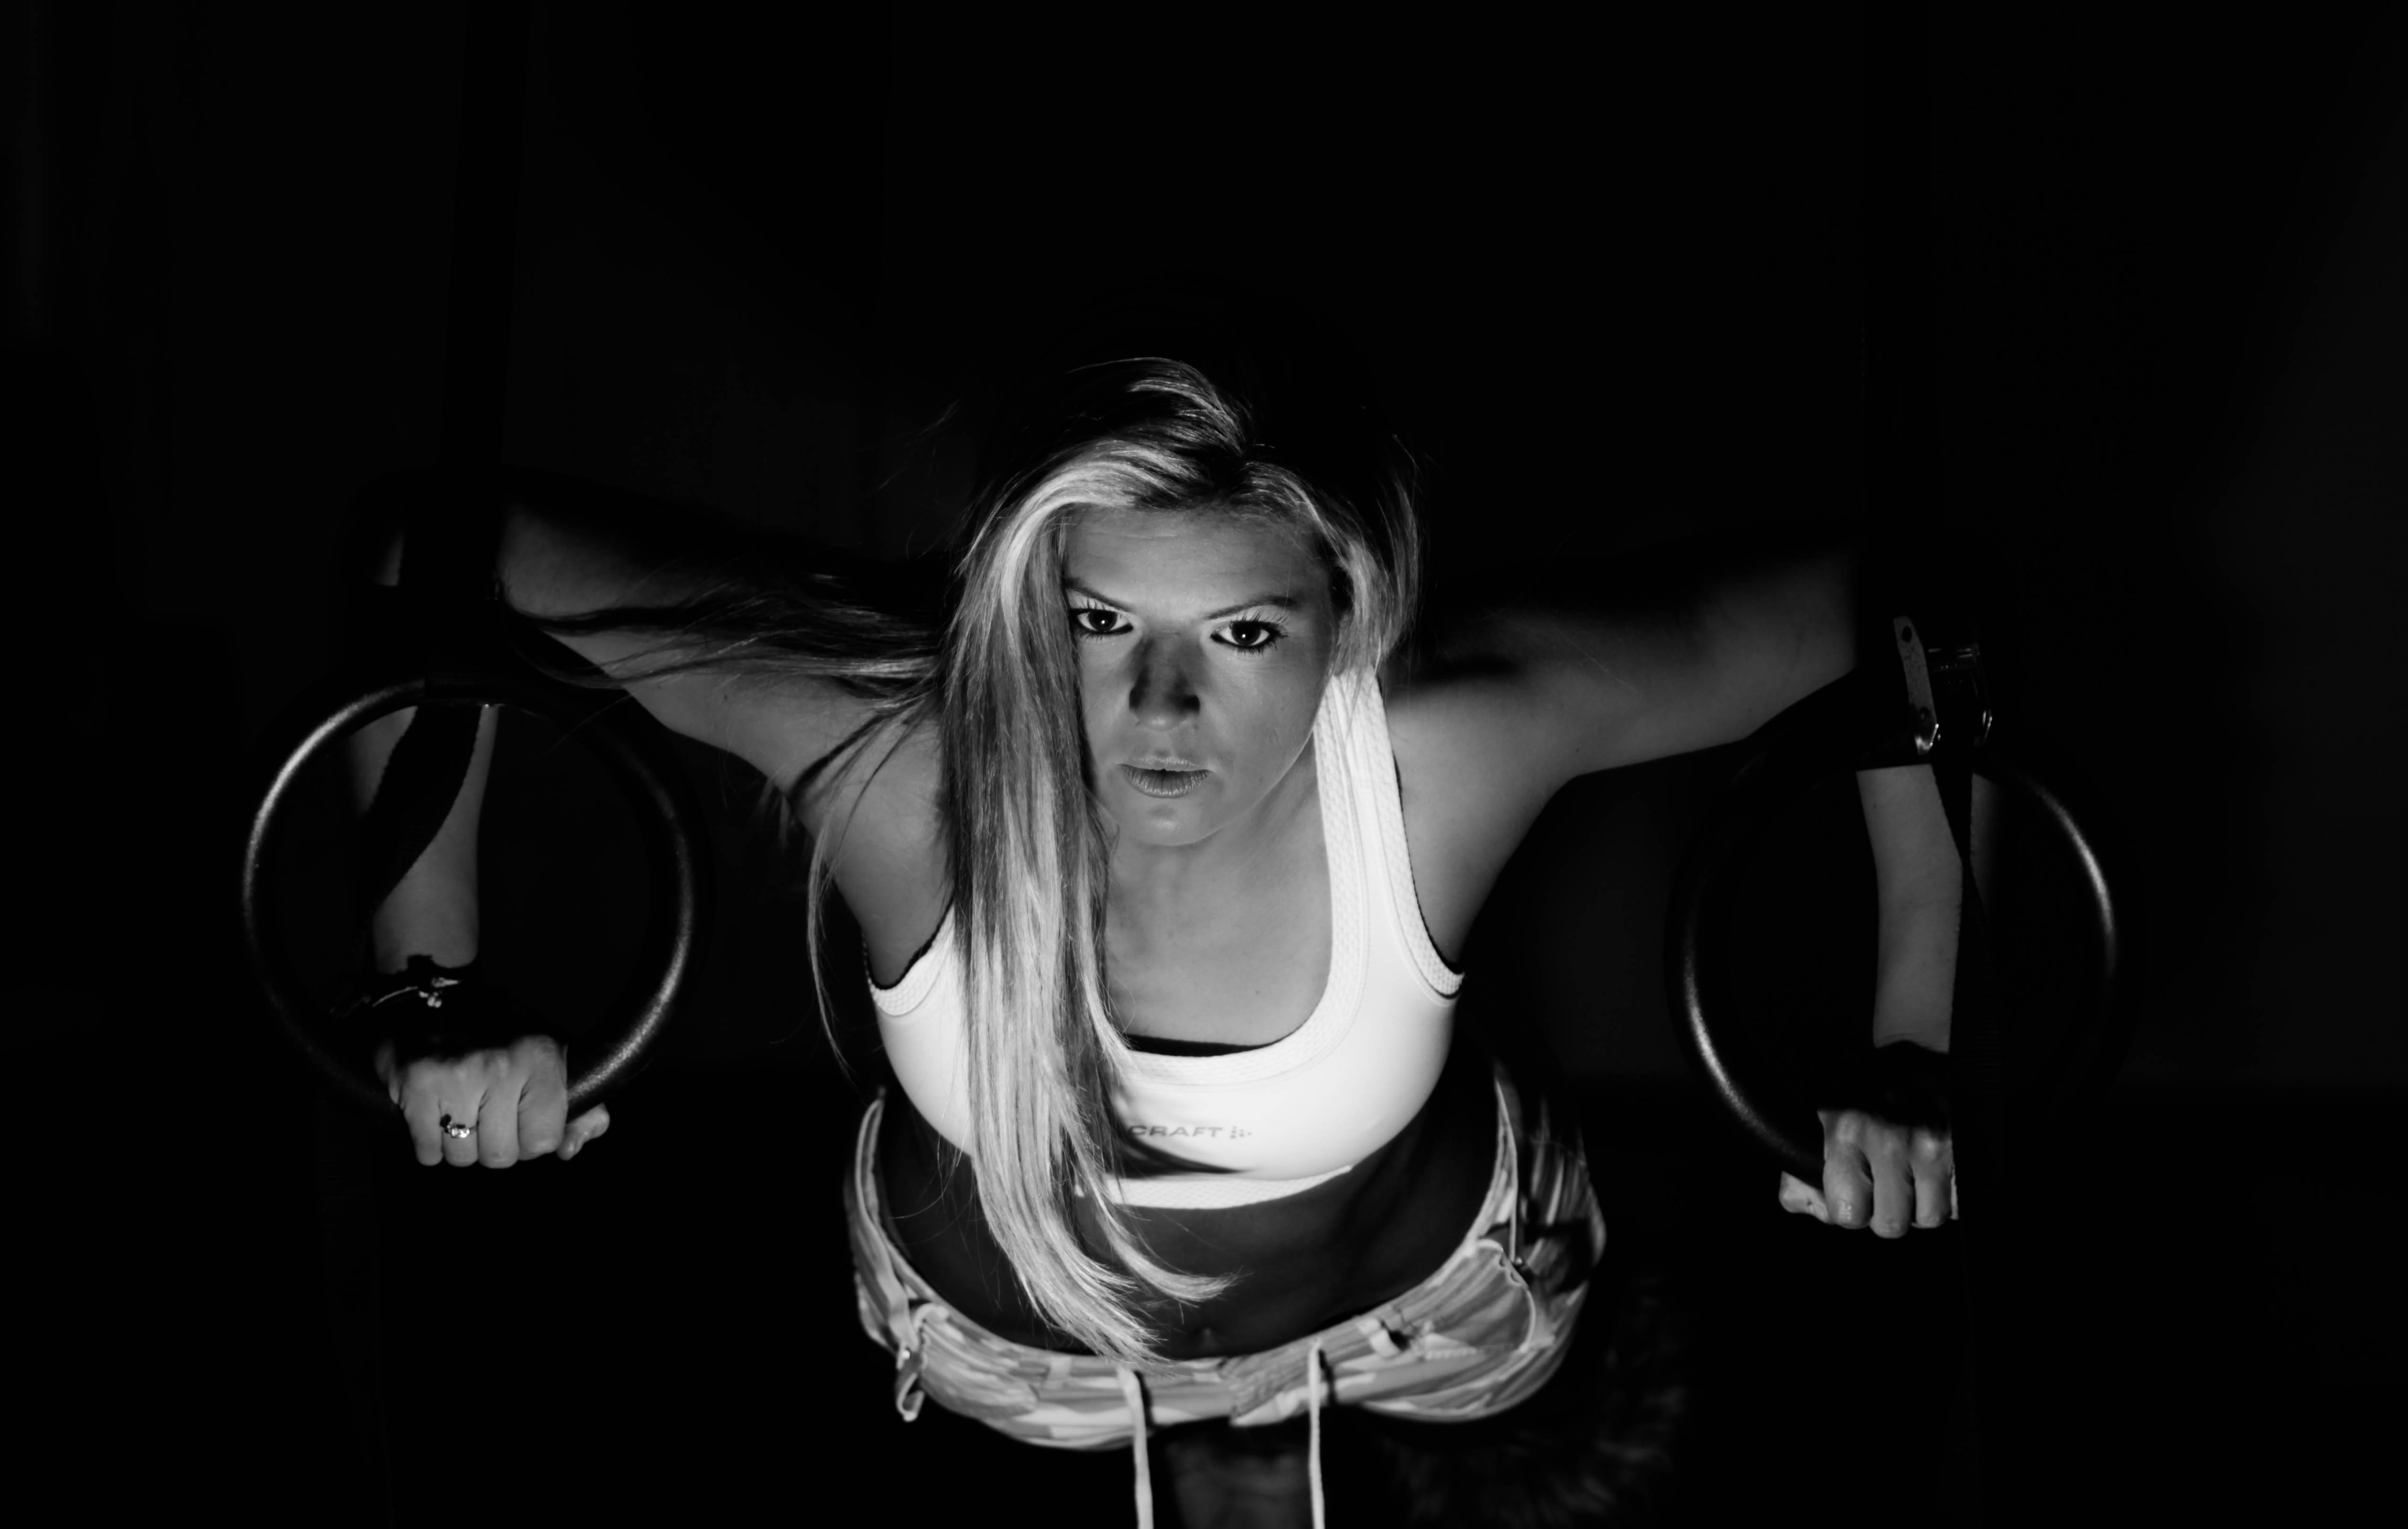 Girl power!!, Abs, Exercise, Fitness, Girl, HQ Photo